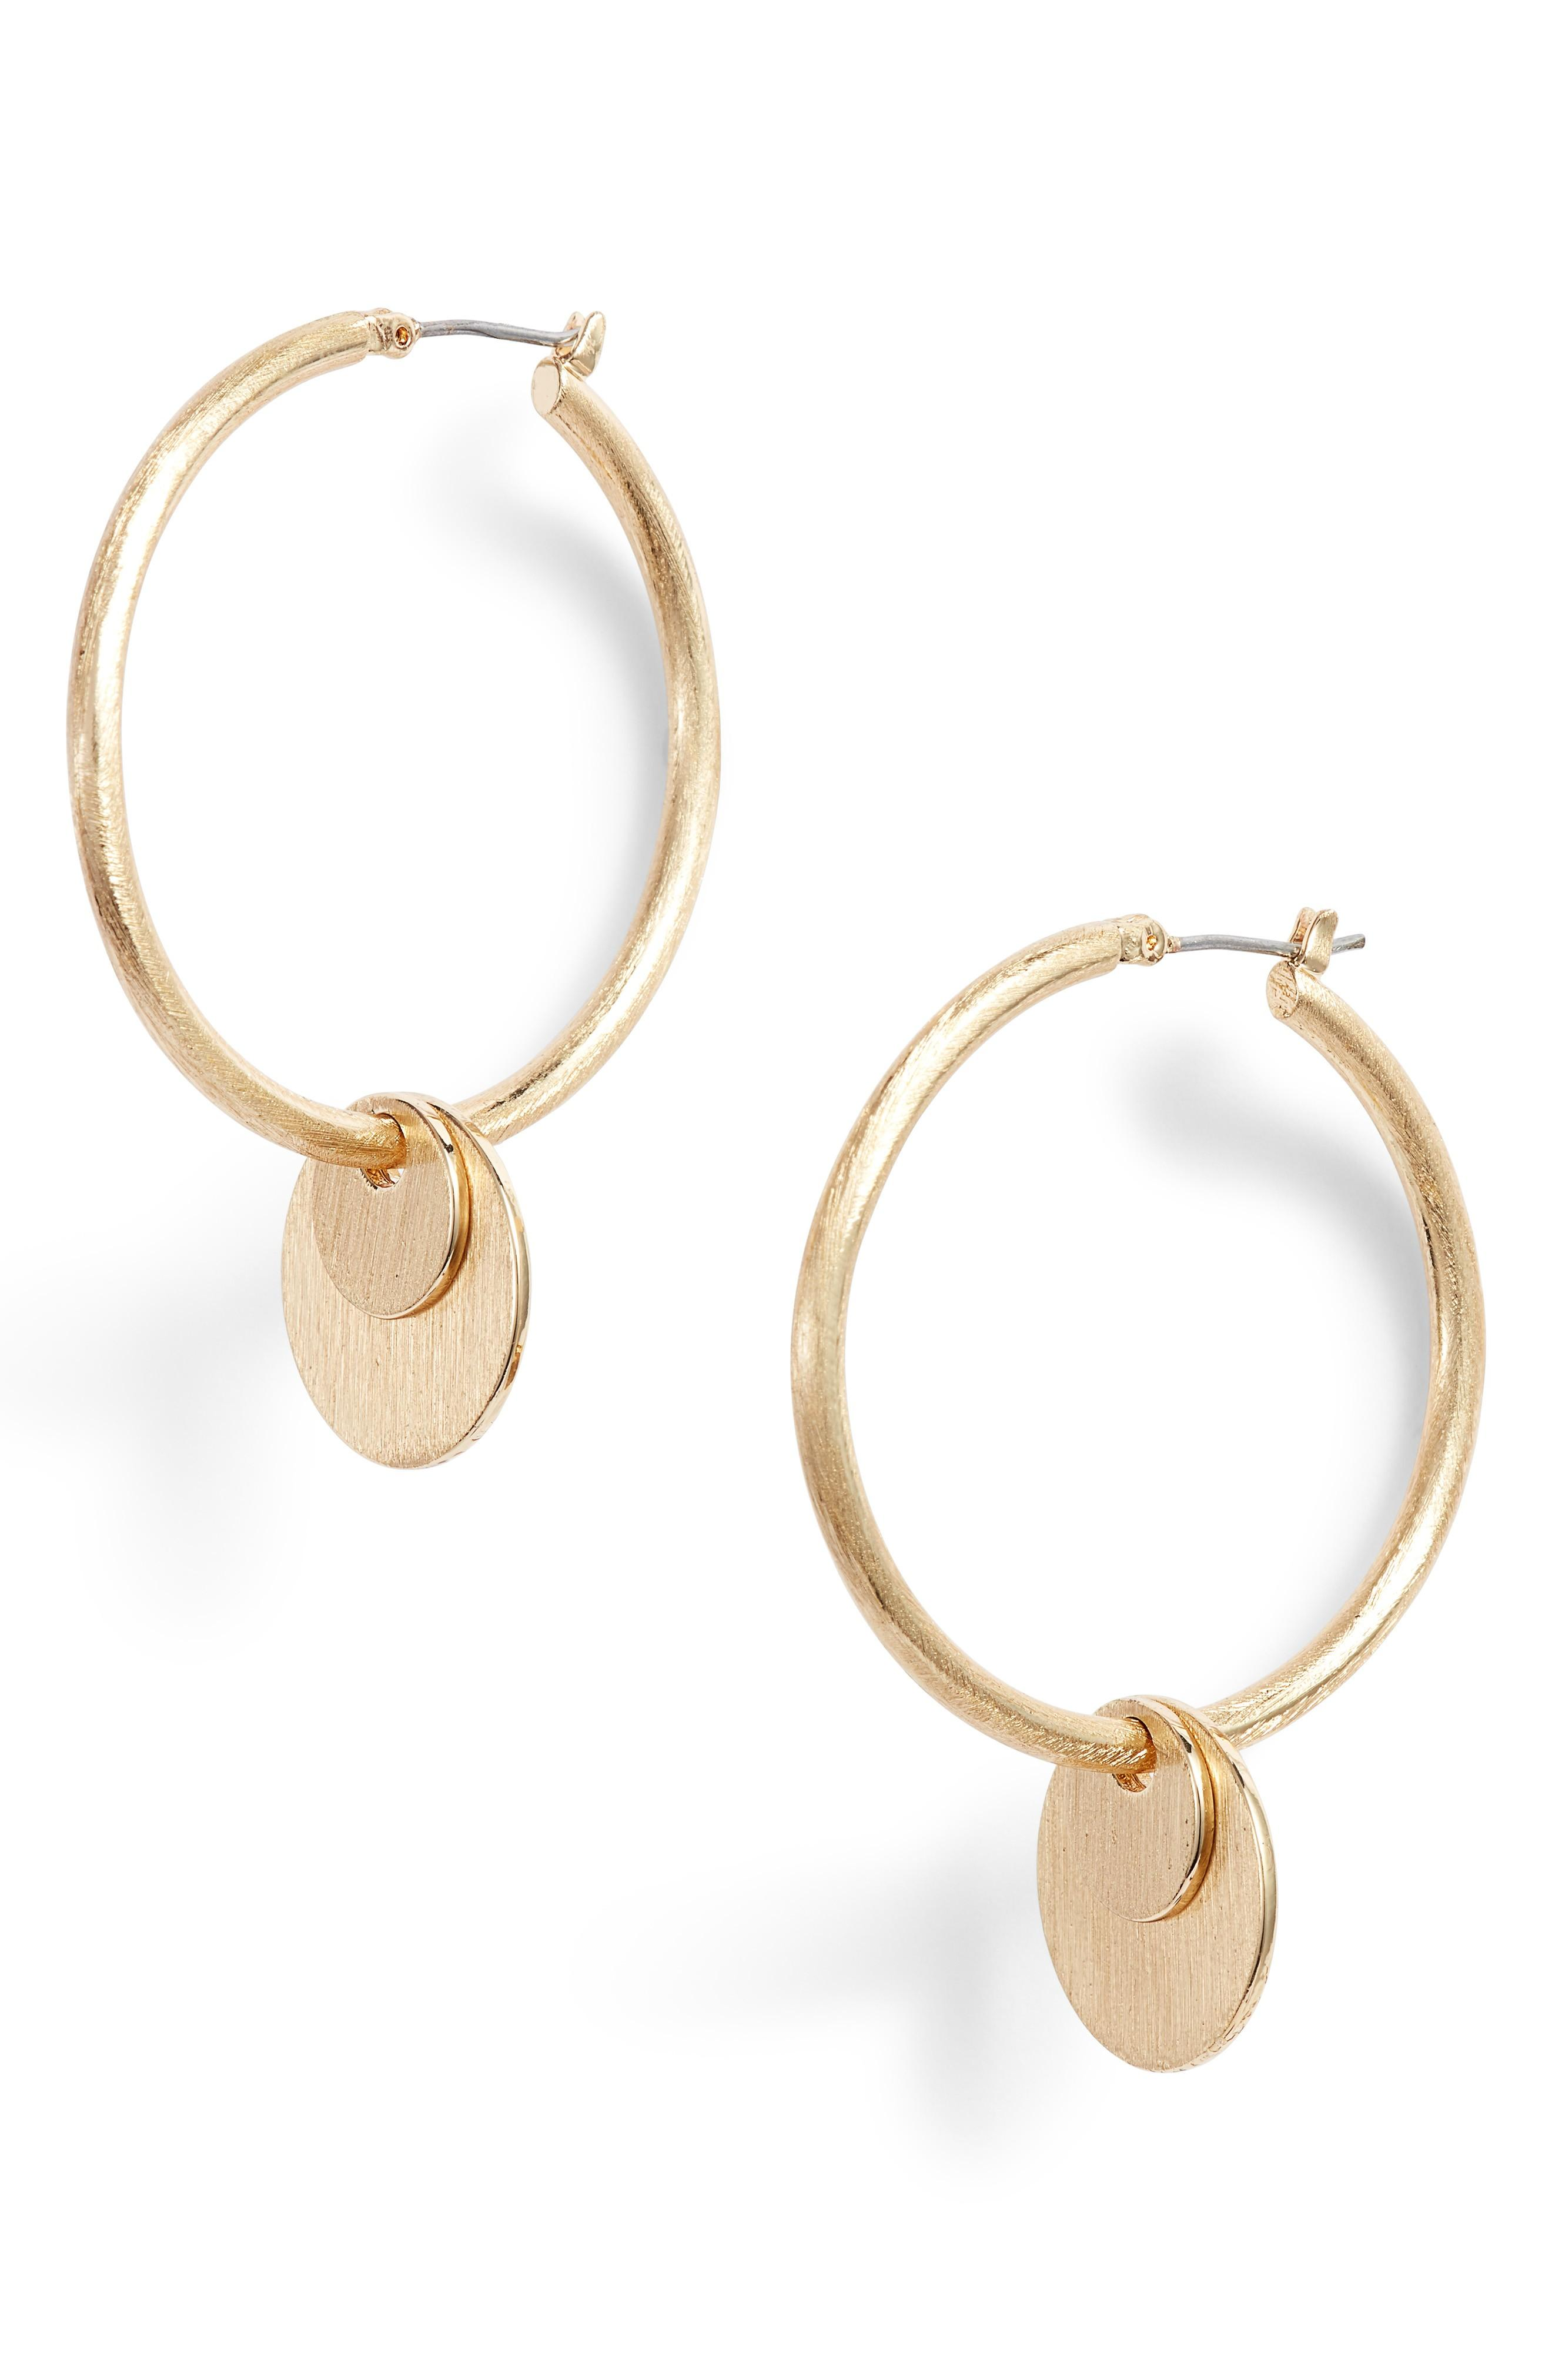 Rebecca Minkoff Medallion Hoop Earrings In Gold